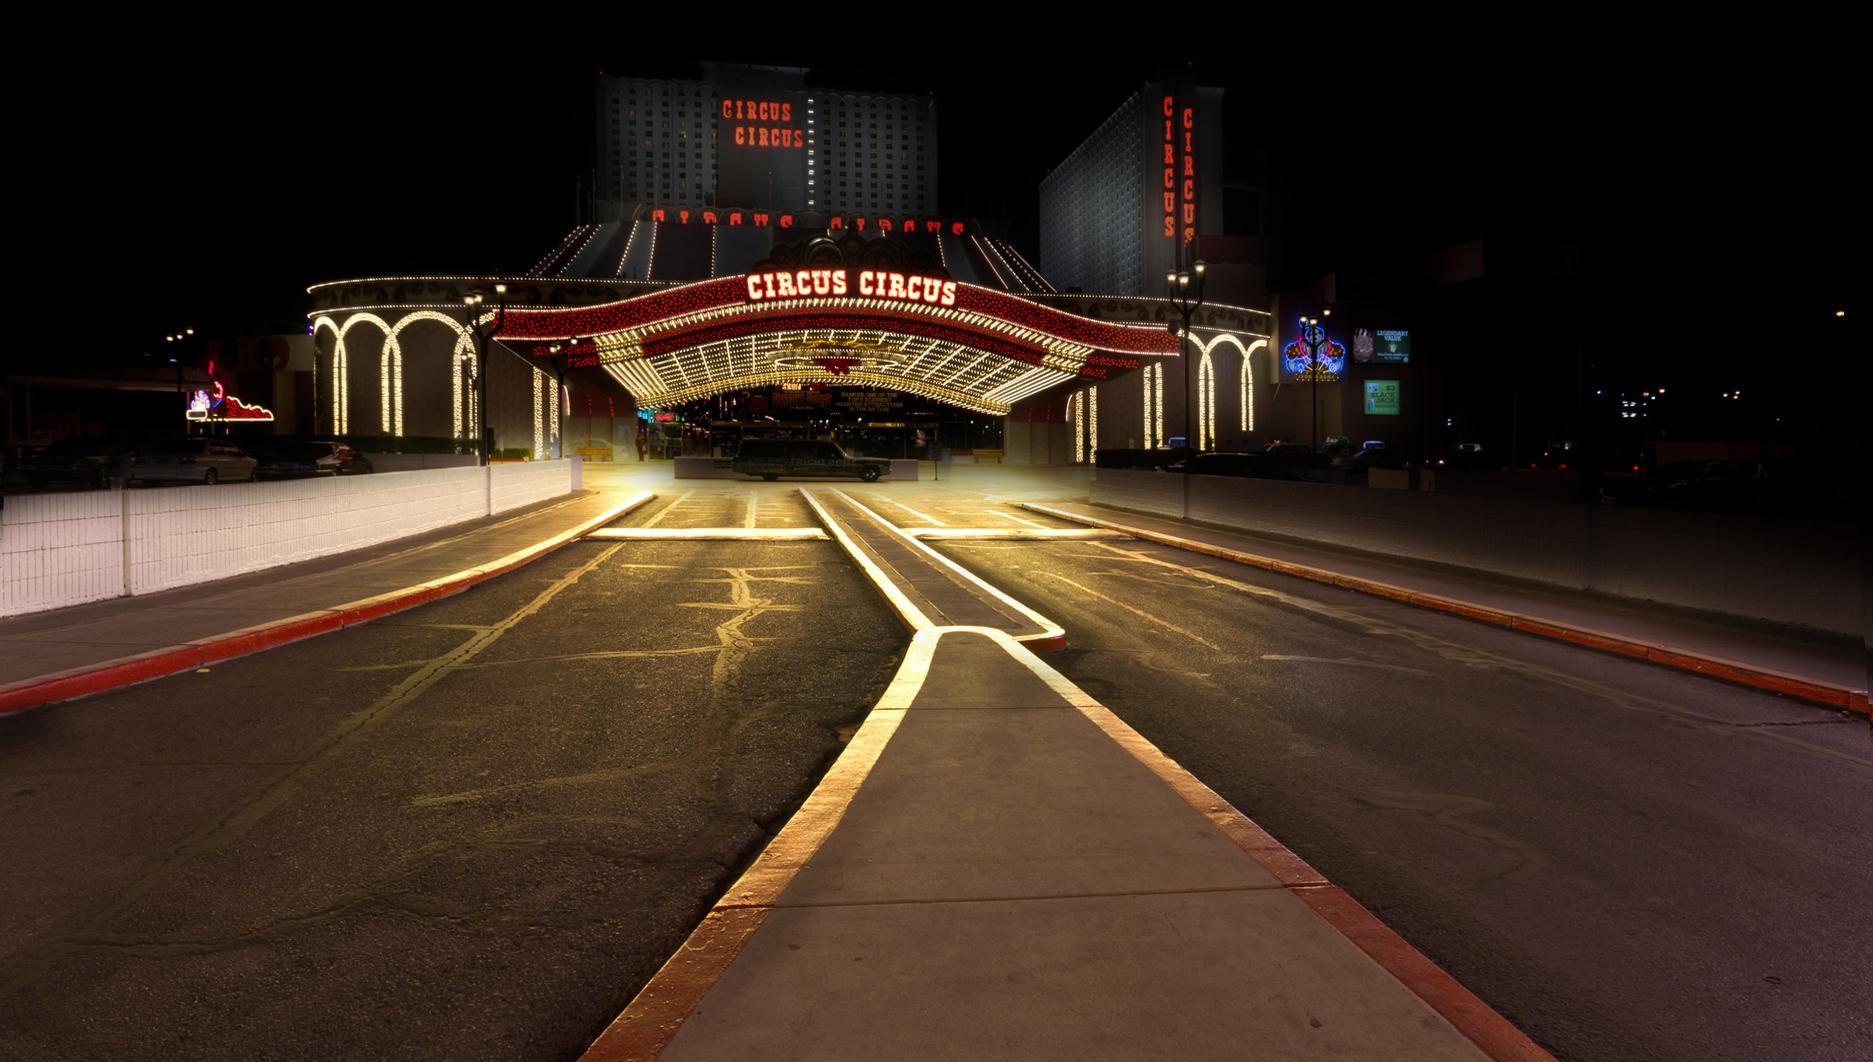 Circus Las Vegas